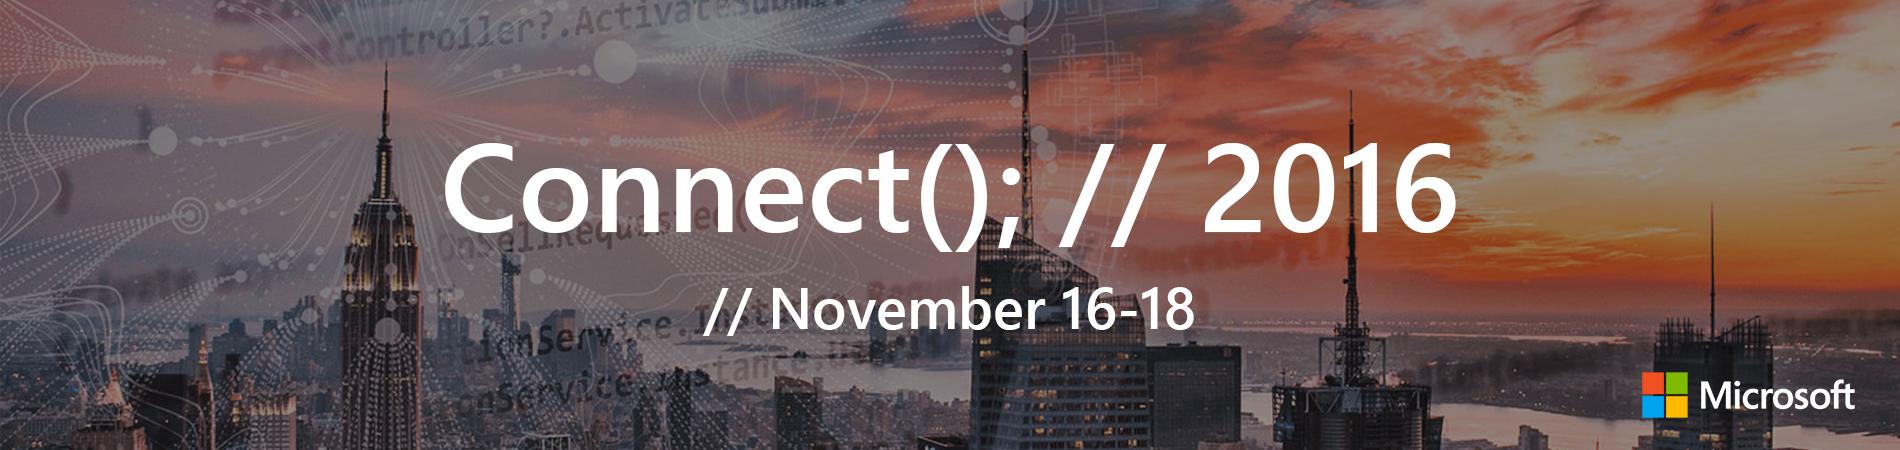 Connect(); // 2016: Текстовая трансляция